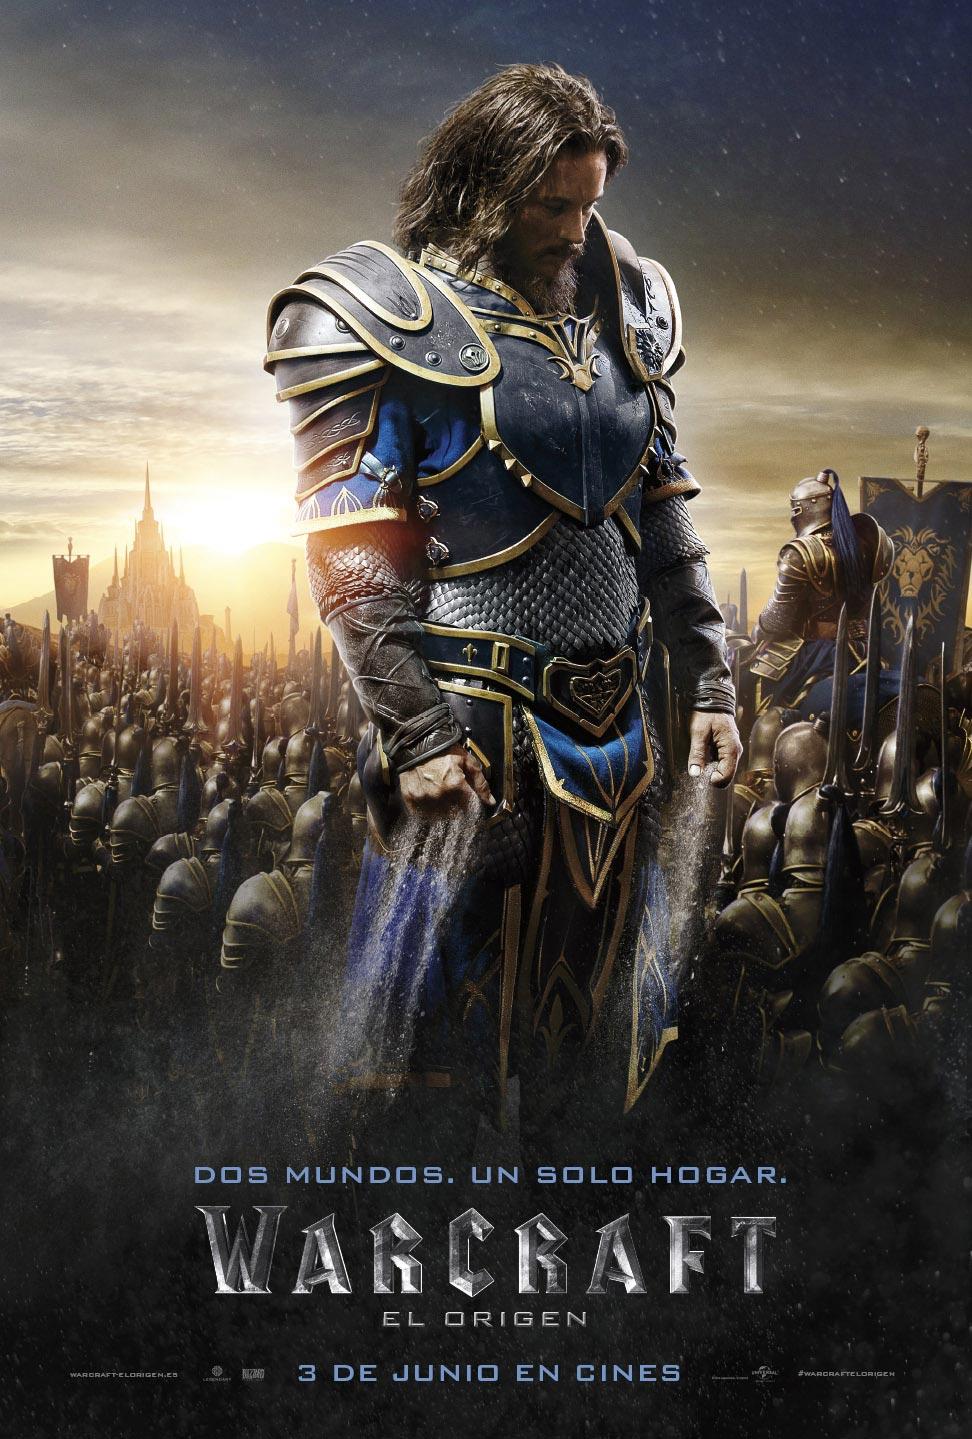 WARCRAFT: El origen Warcraft_el_origen-cartel-6820